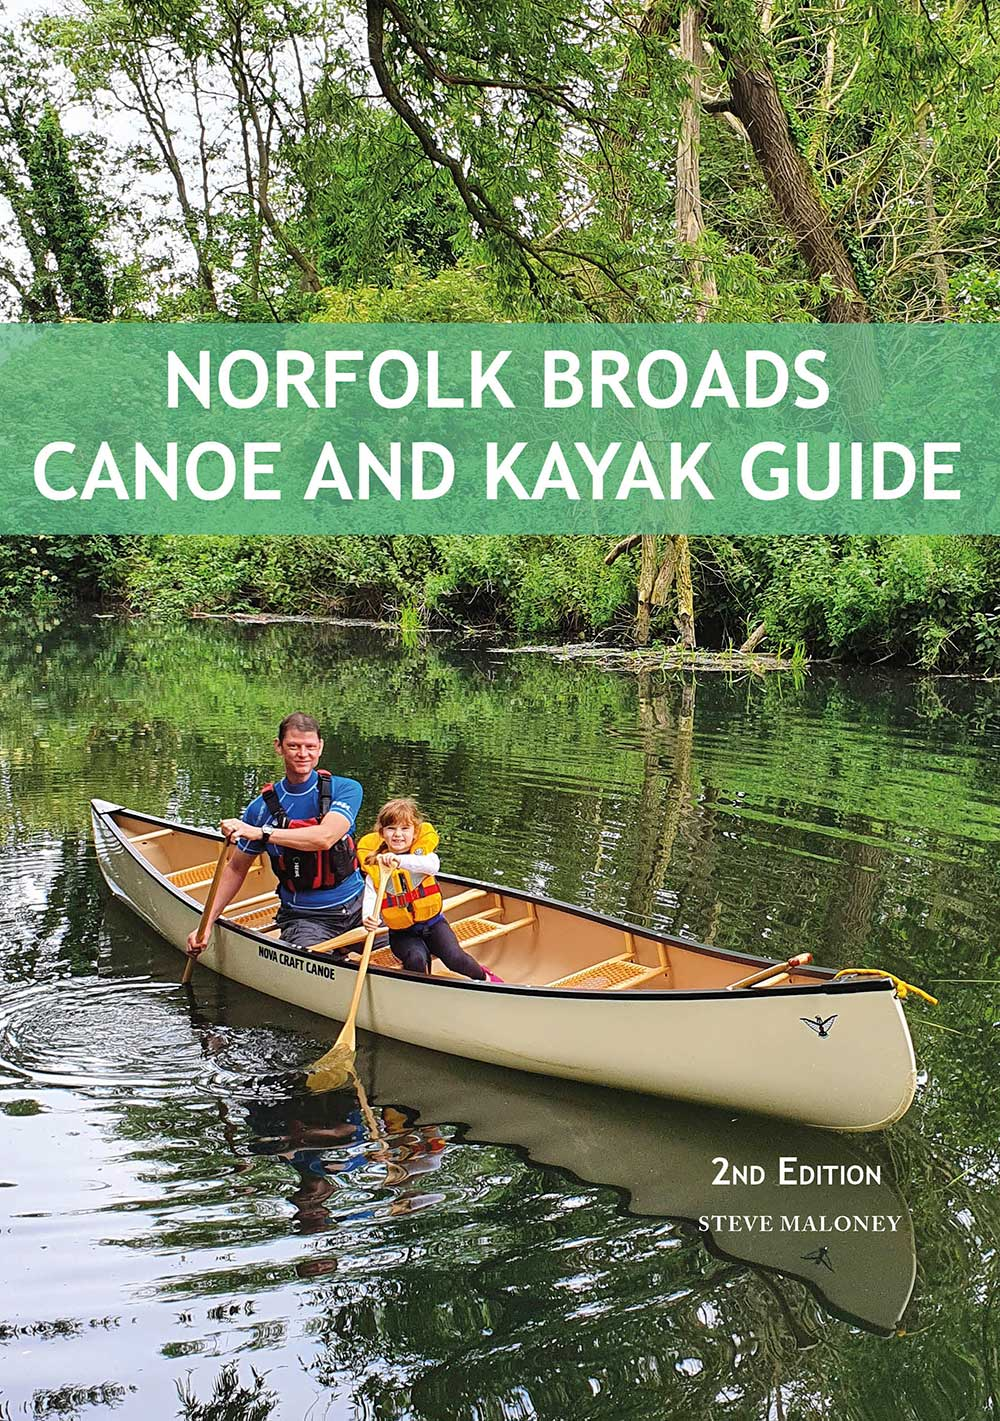 Norfolk Broads Canoe and Kayak Guide